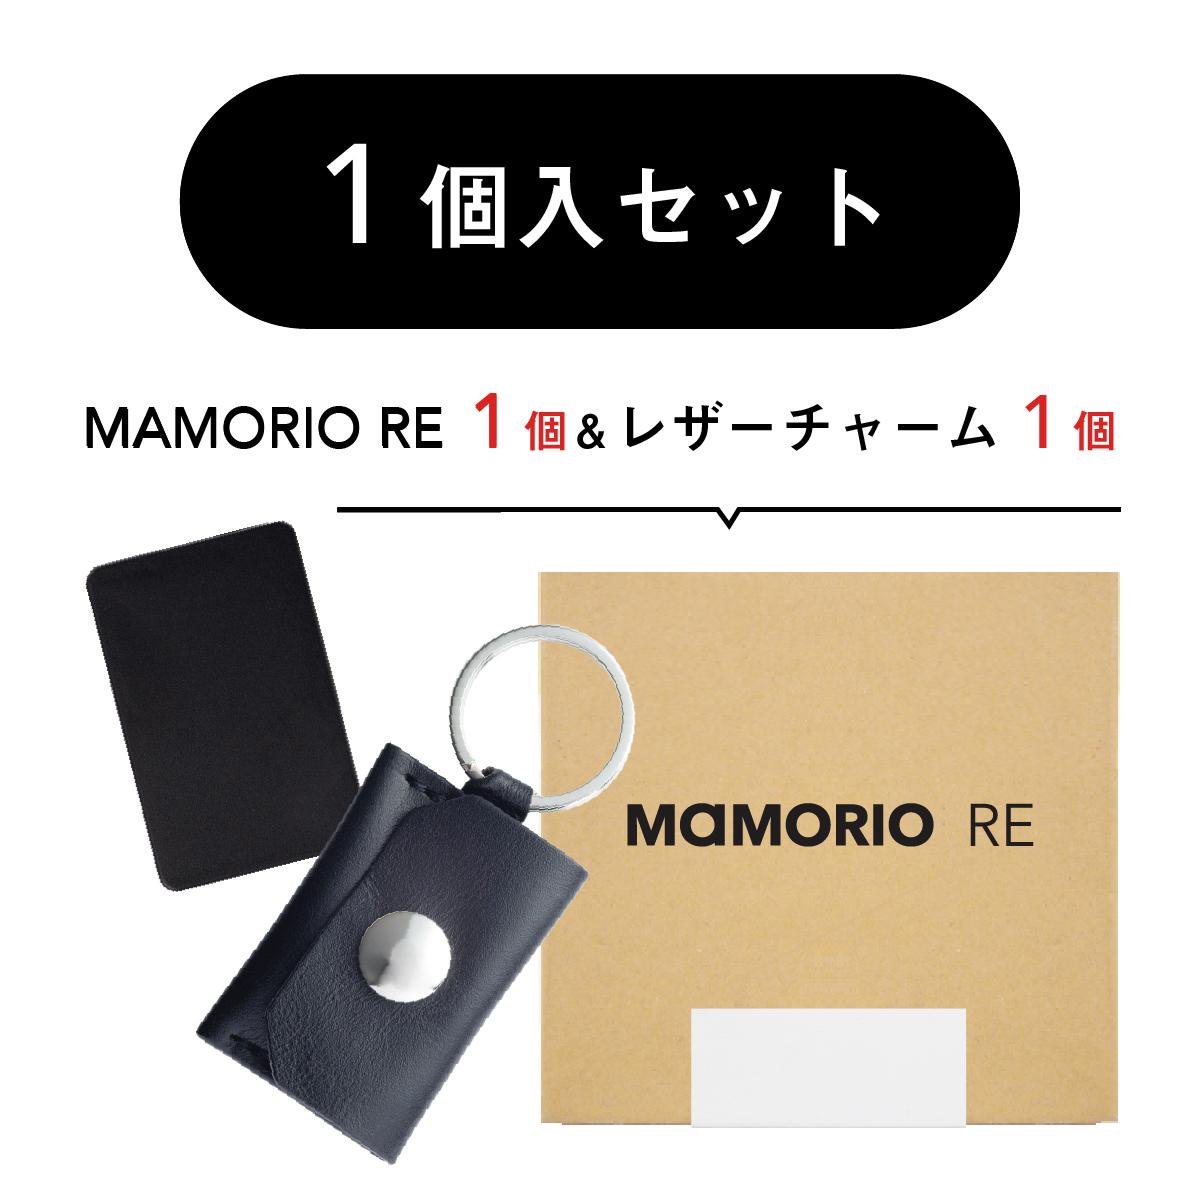 RE1個入 レザーチャーム1個セット 紛失防止タグ 落し物防止 忘れ物防止 全国どこでも送料無料 タグ グッズ 贈物 子供 鍵 スマホ連携 Bluetooth ストラップ アプリ無料 送料無料 キーホルダー ケース 財布 袋